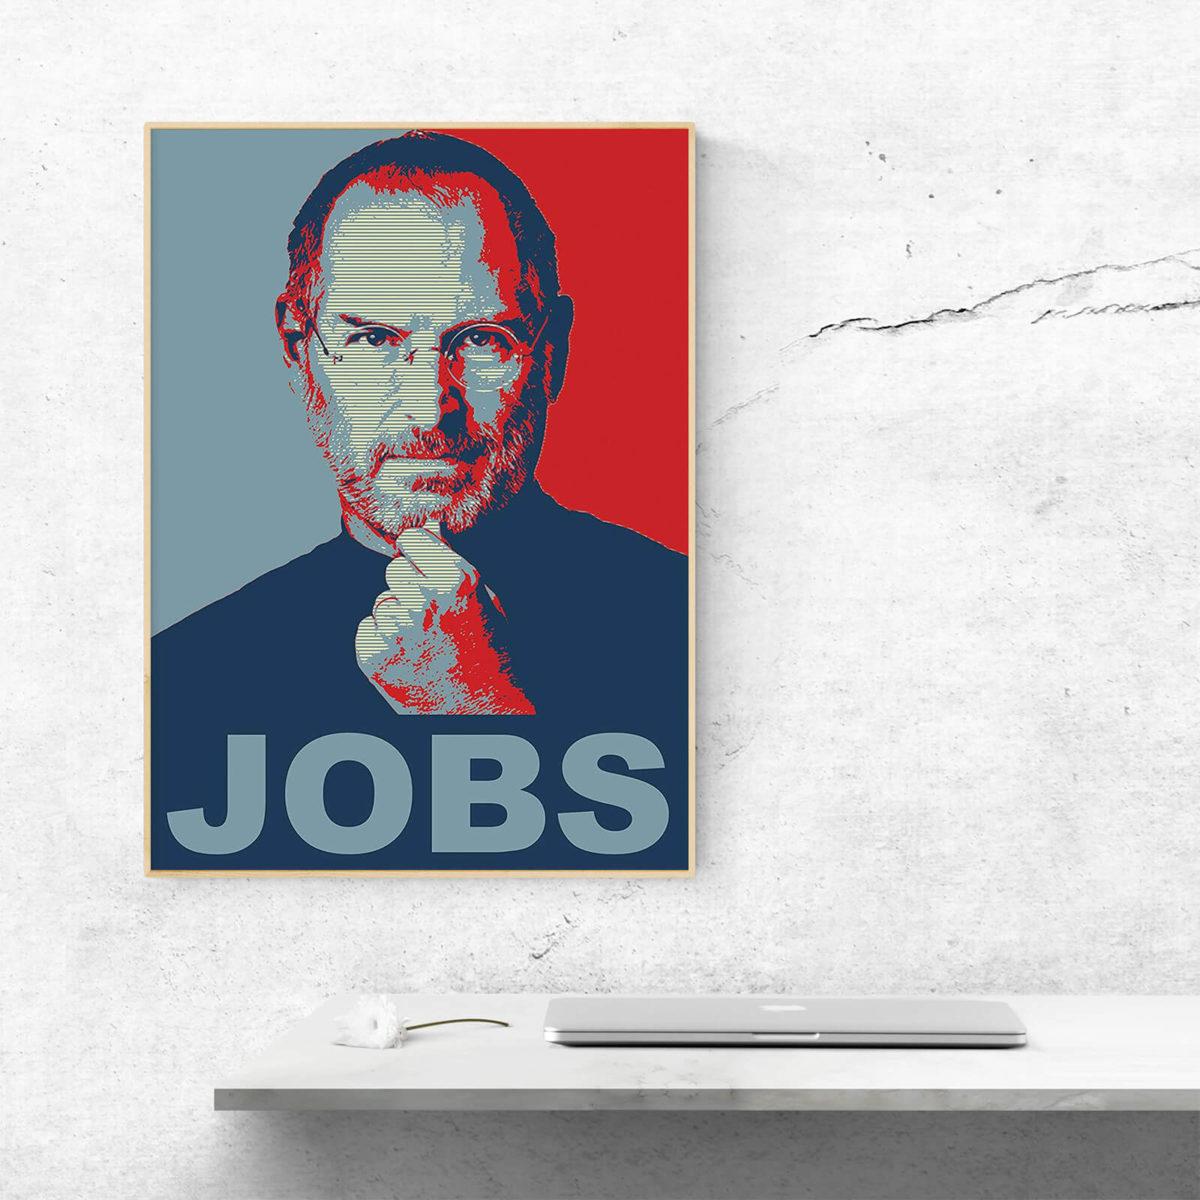 Das Bild des verstorbenen Visionärs Steve Jobs